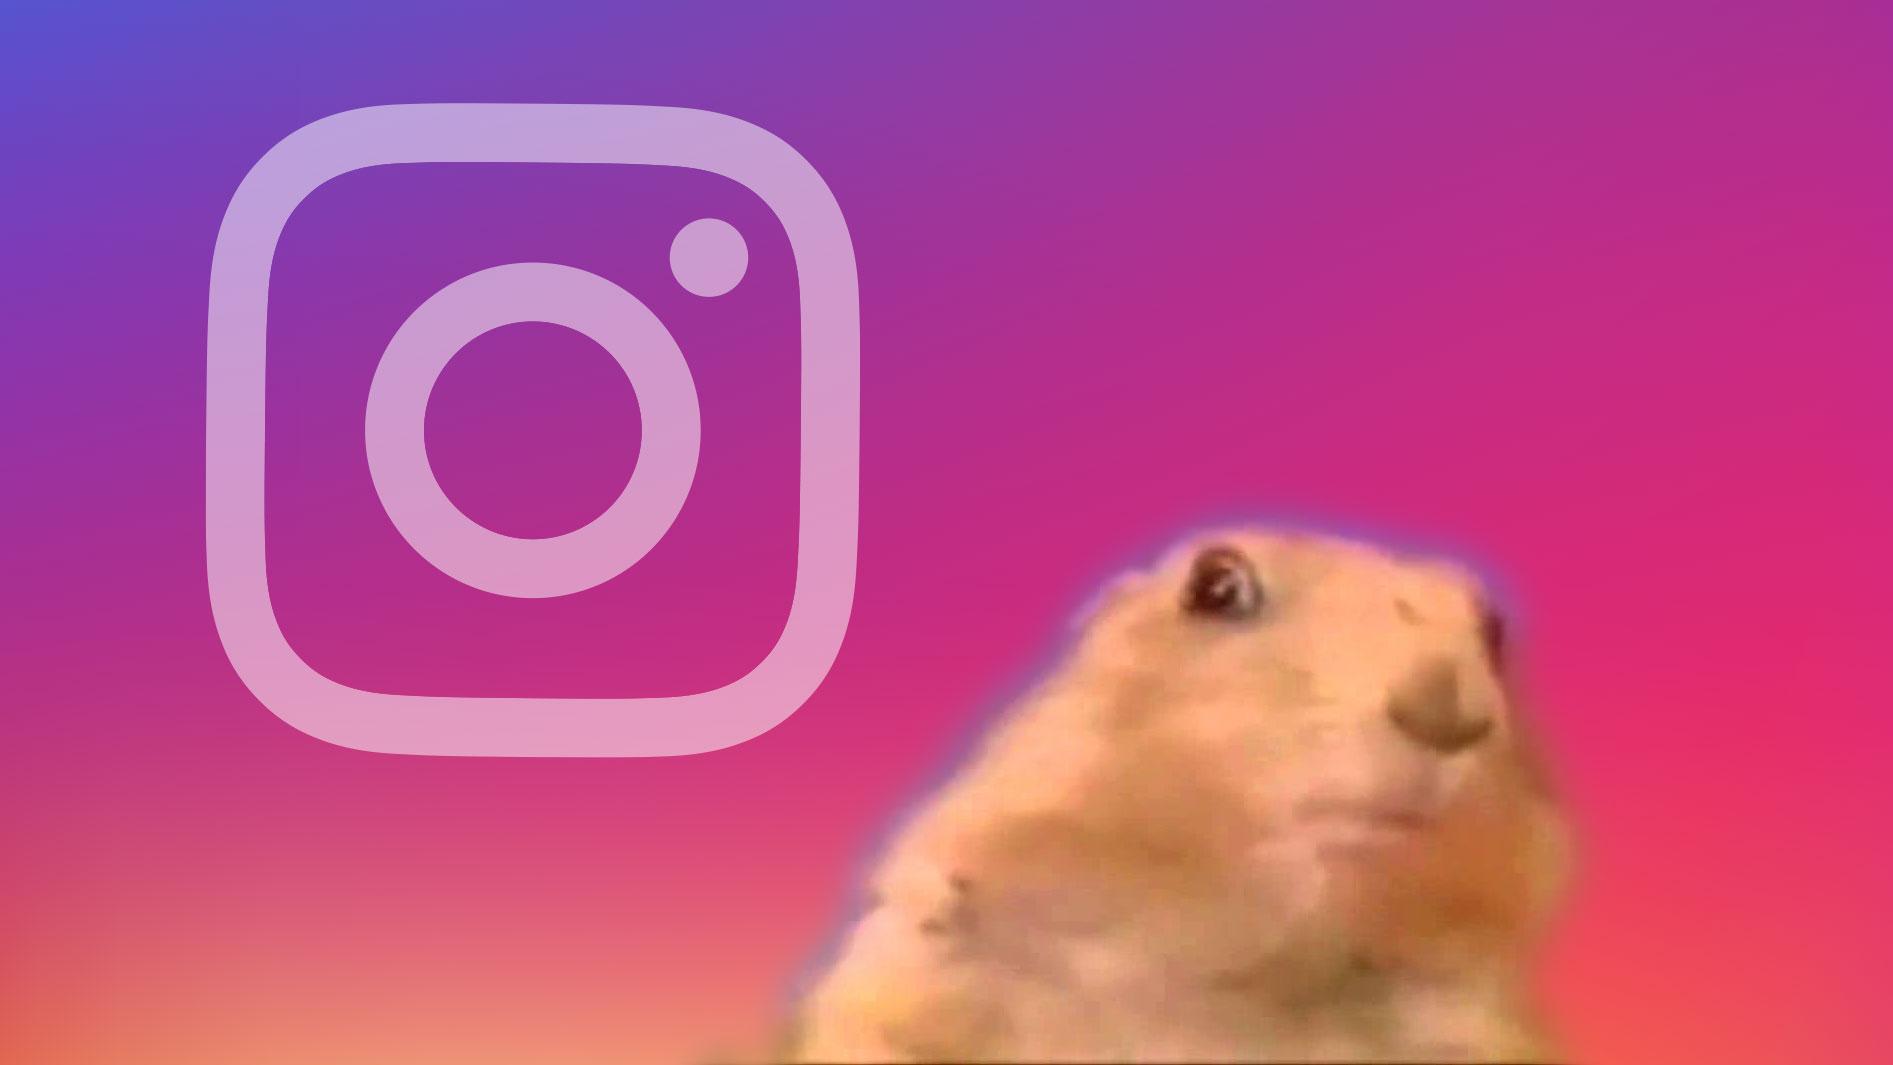 Instagram Superzoom records dramatic close-up videos | TechCrunch